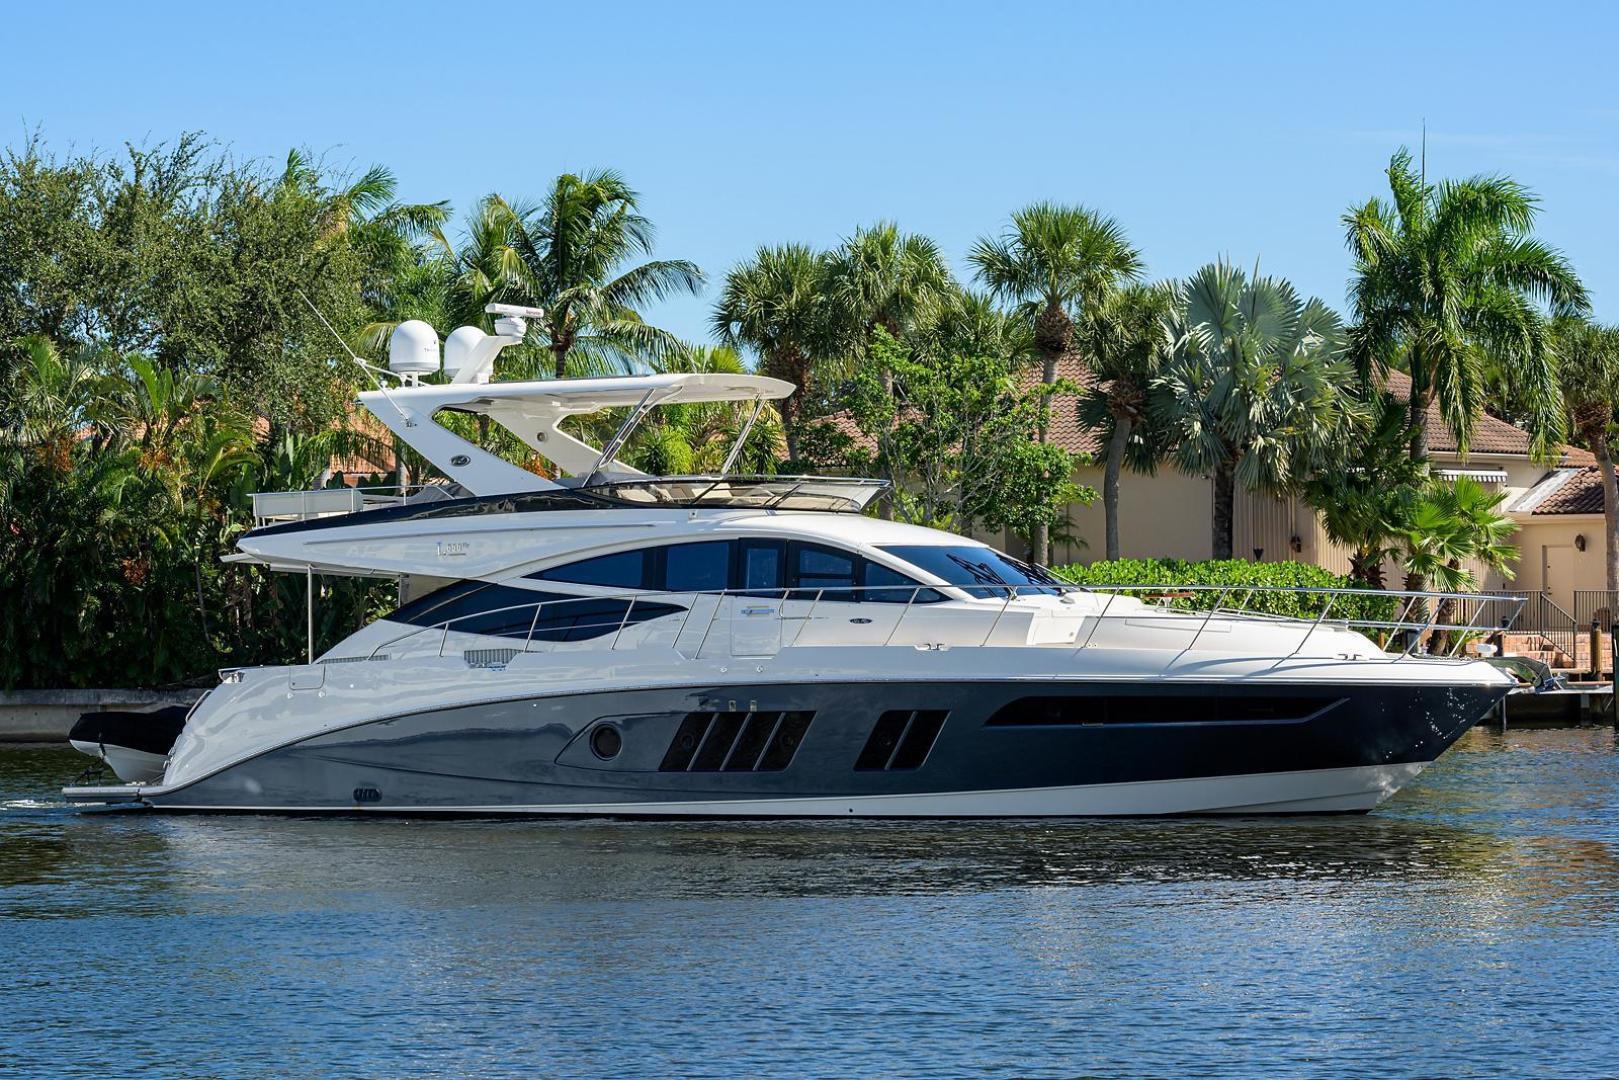 Sea Ray-L650 Fly 2015-KNOT ON CALL Juno Beach-Florida-United States-1476284 | Thumbnail